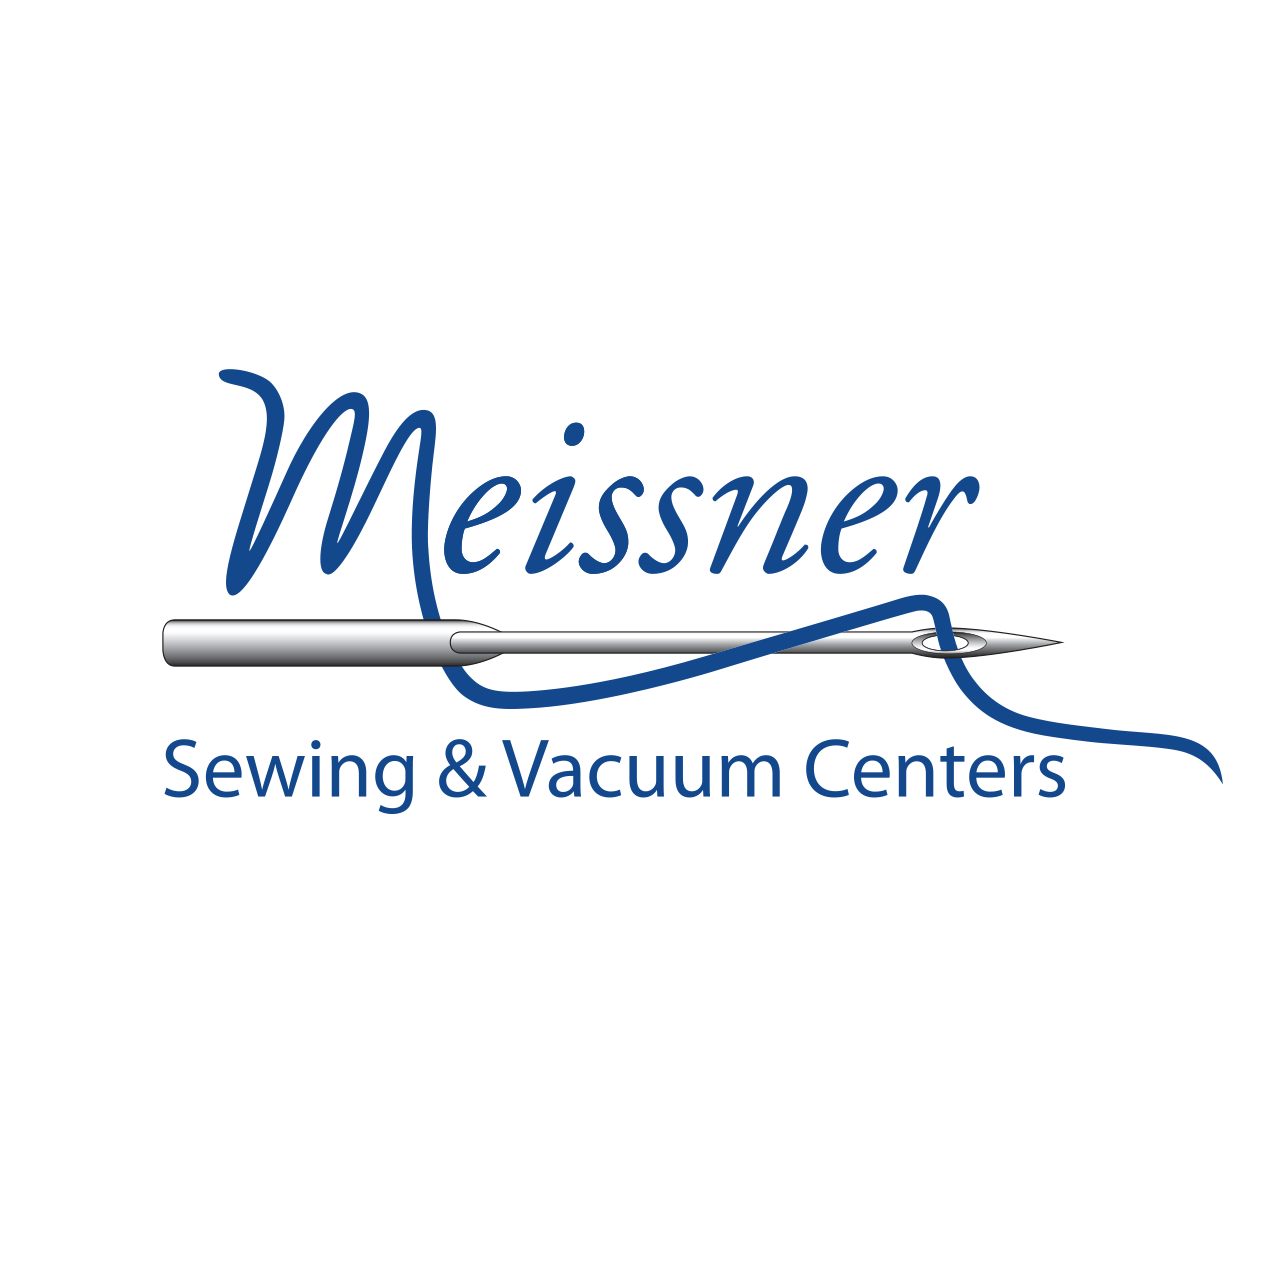 Industrial sewing machines: classes, purpose, maintenance 78